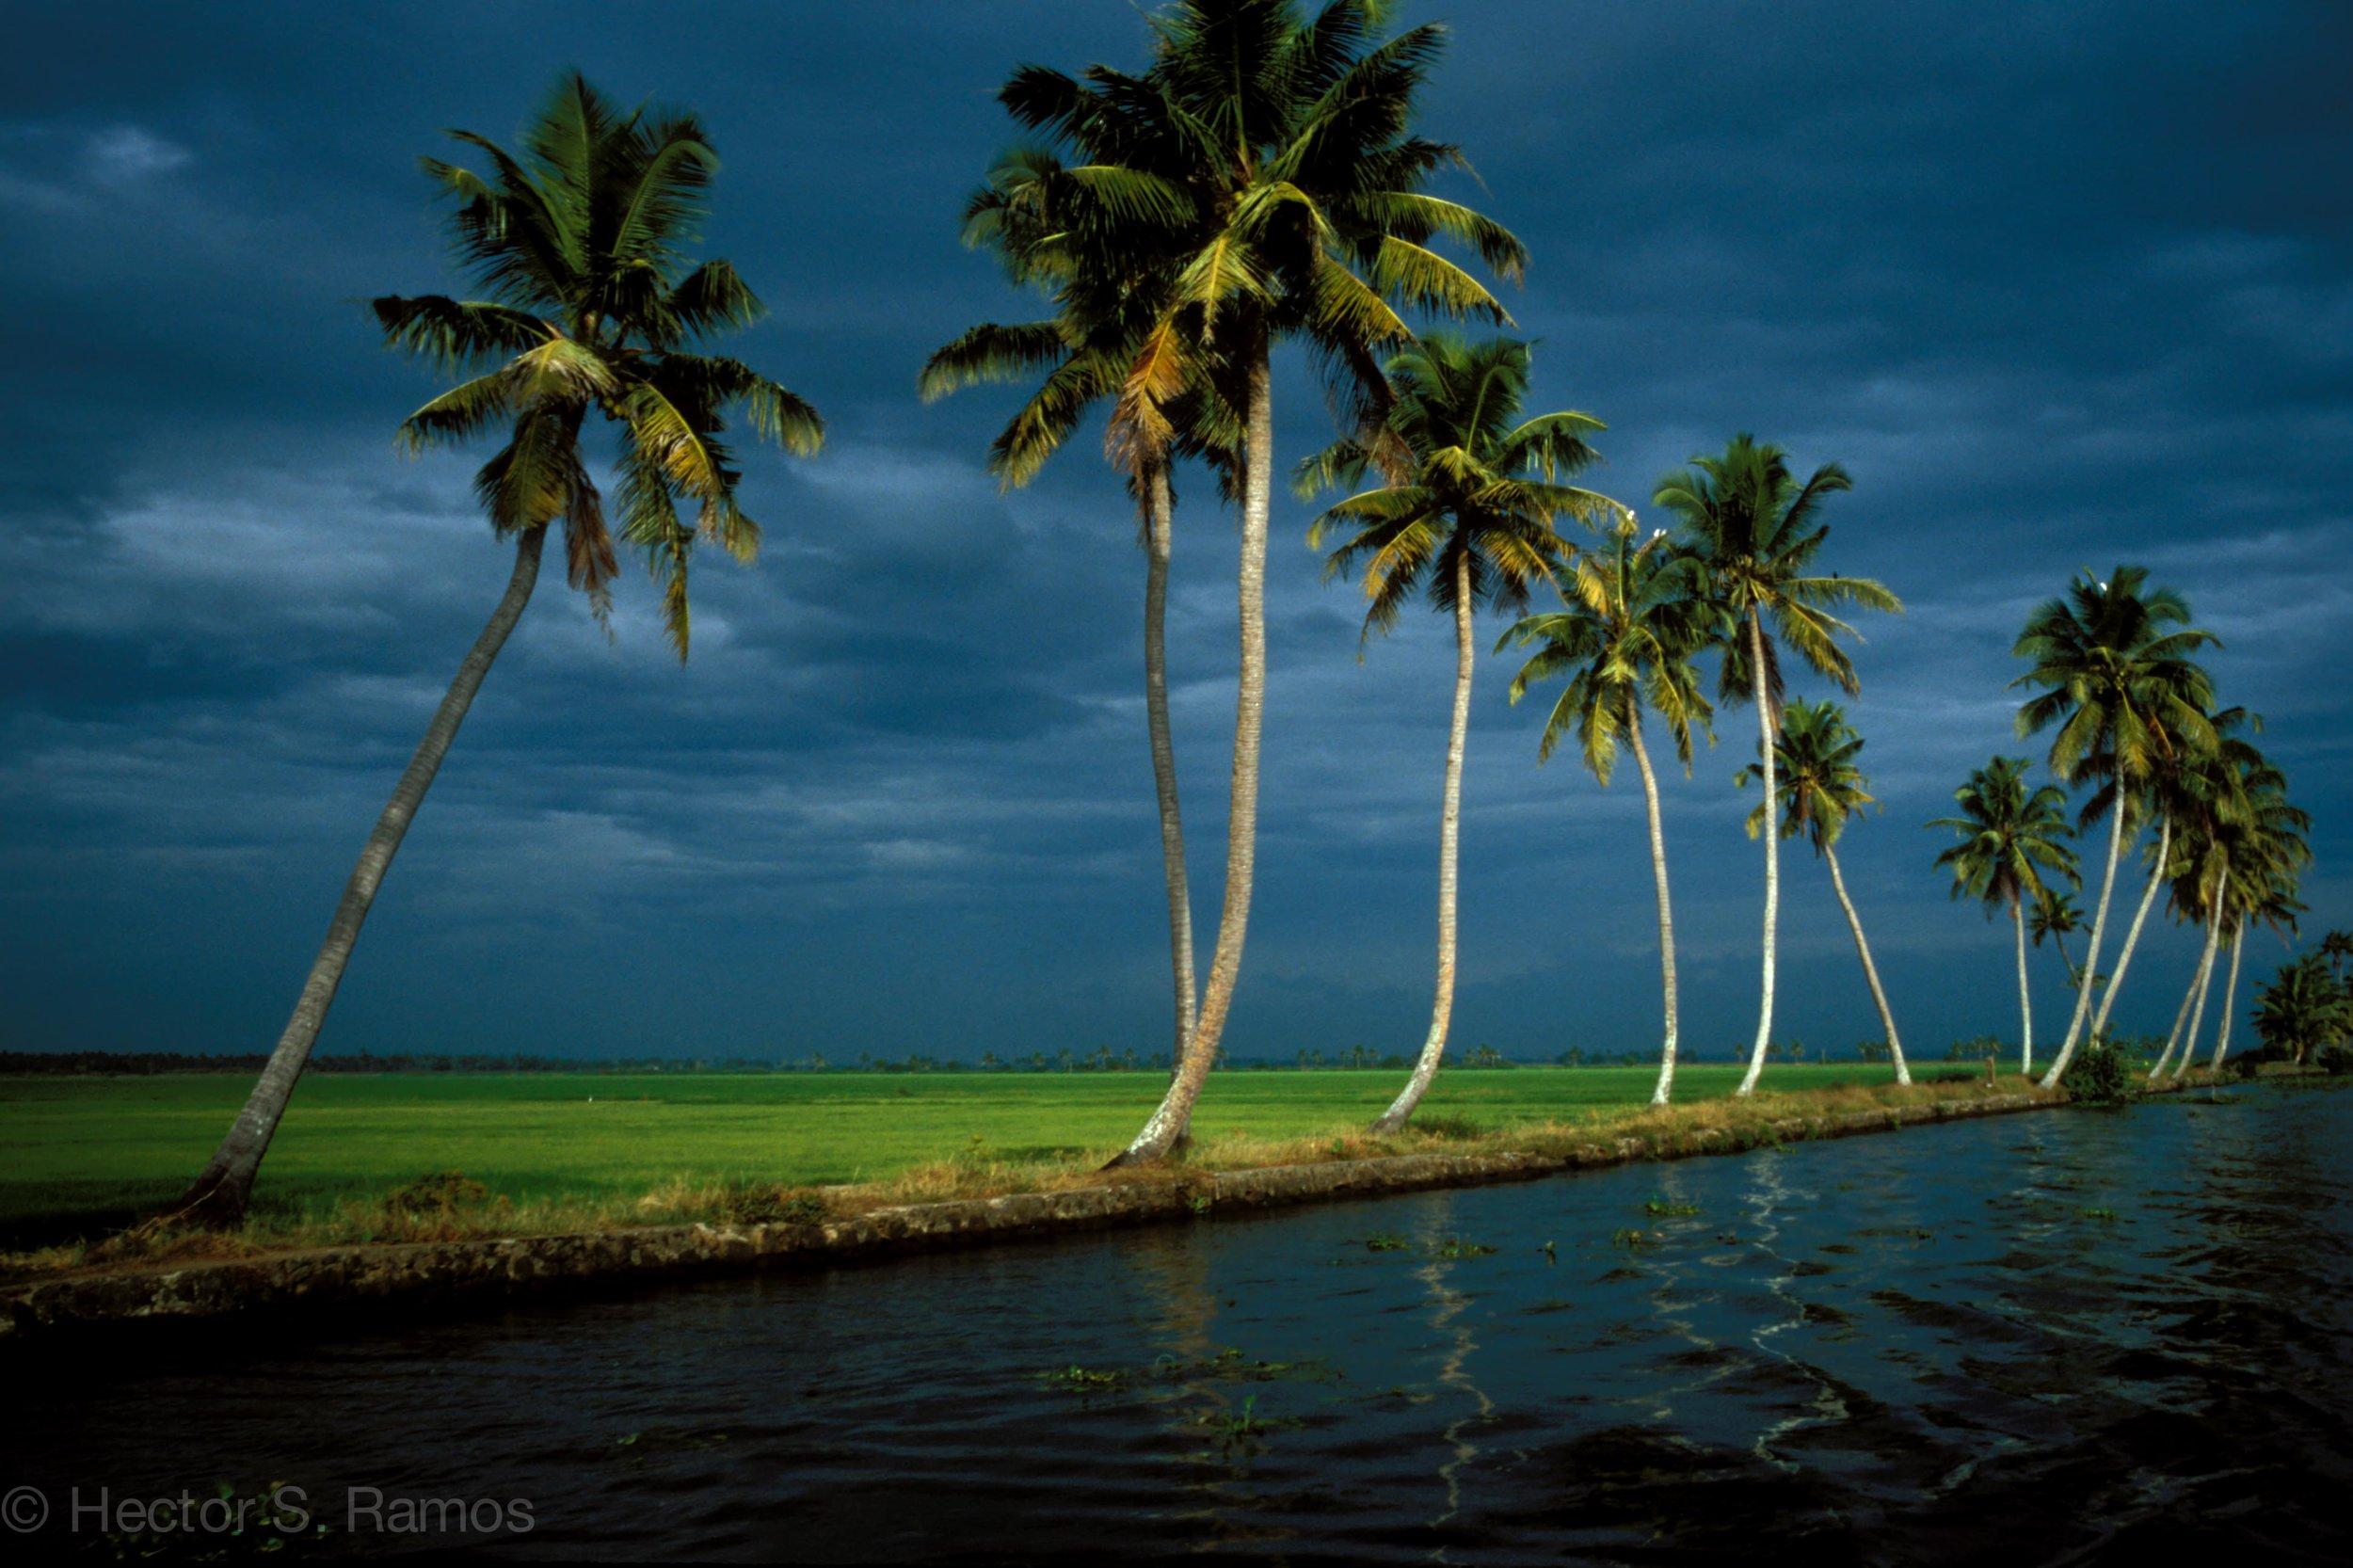 Kerala backwaters. Photo: Leica MP, 35mm Summilux, Velvia 50.